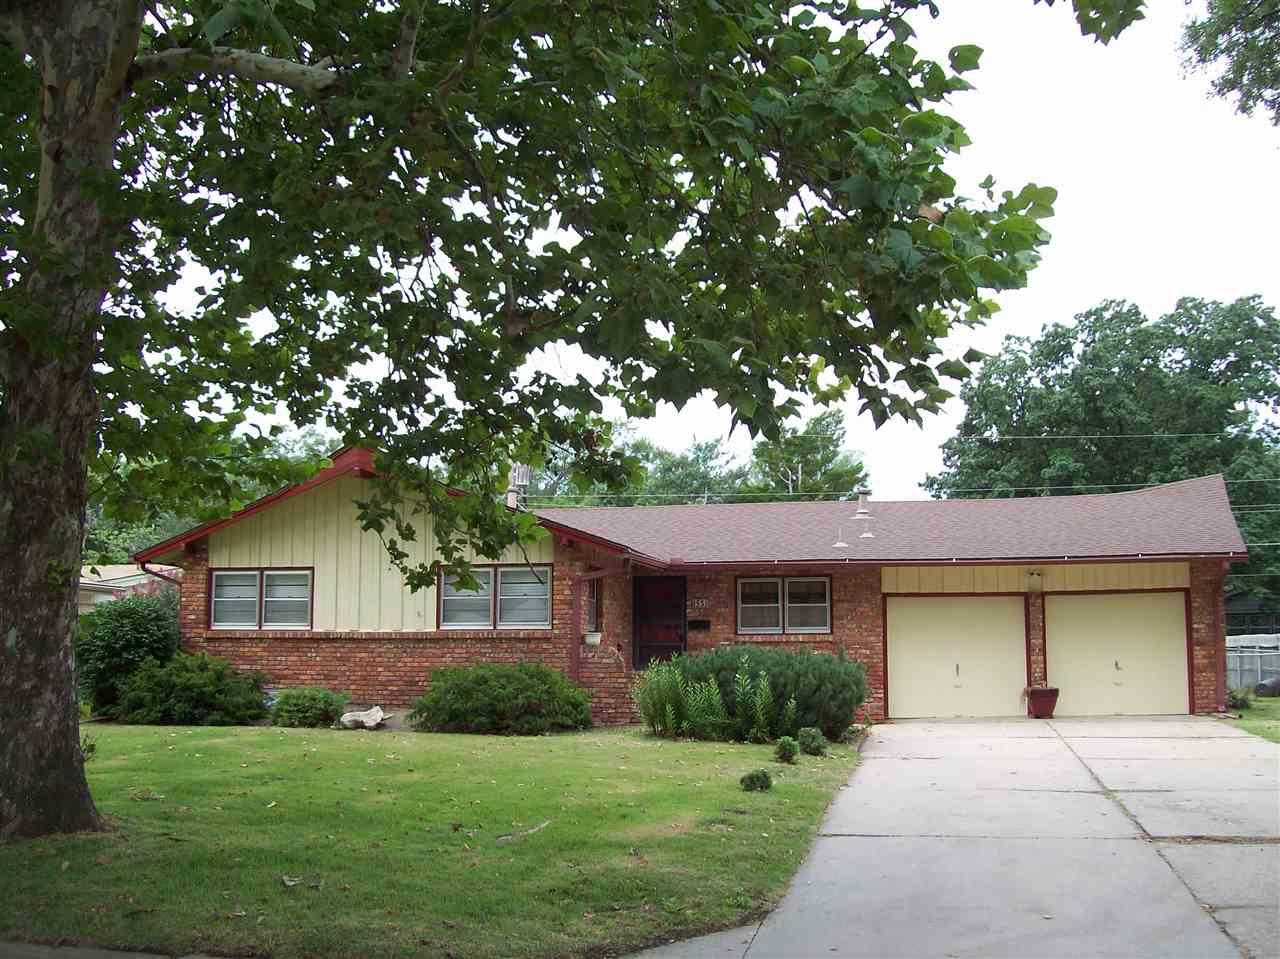 853 N PETERSON AVE, Wichita, KS 67212